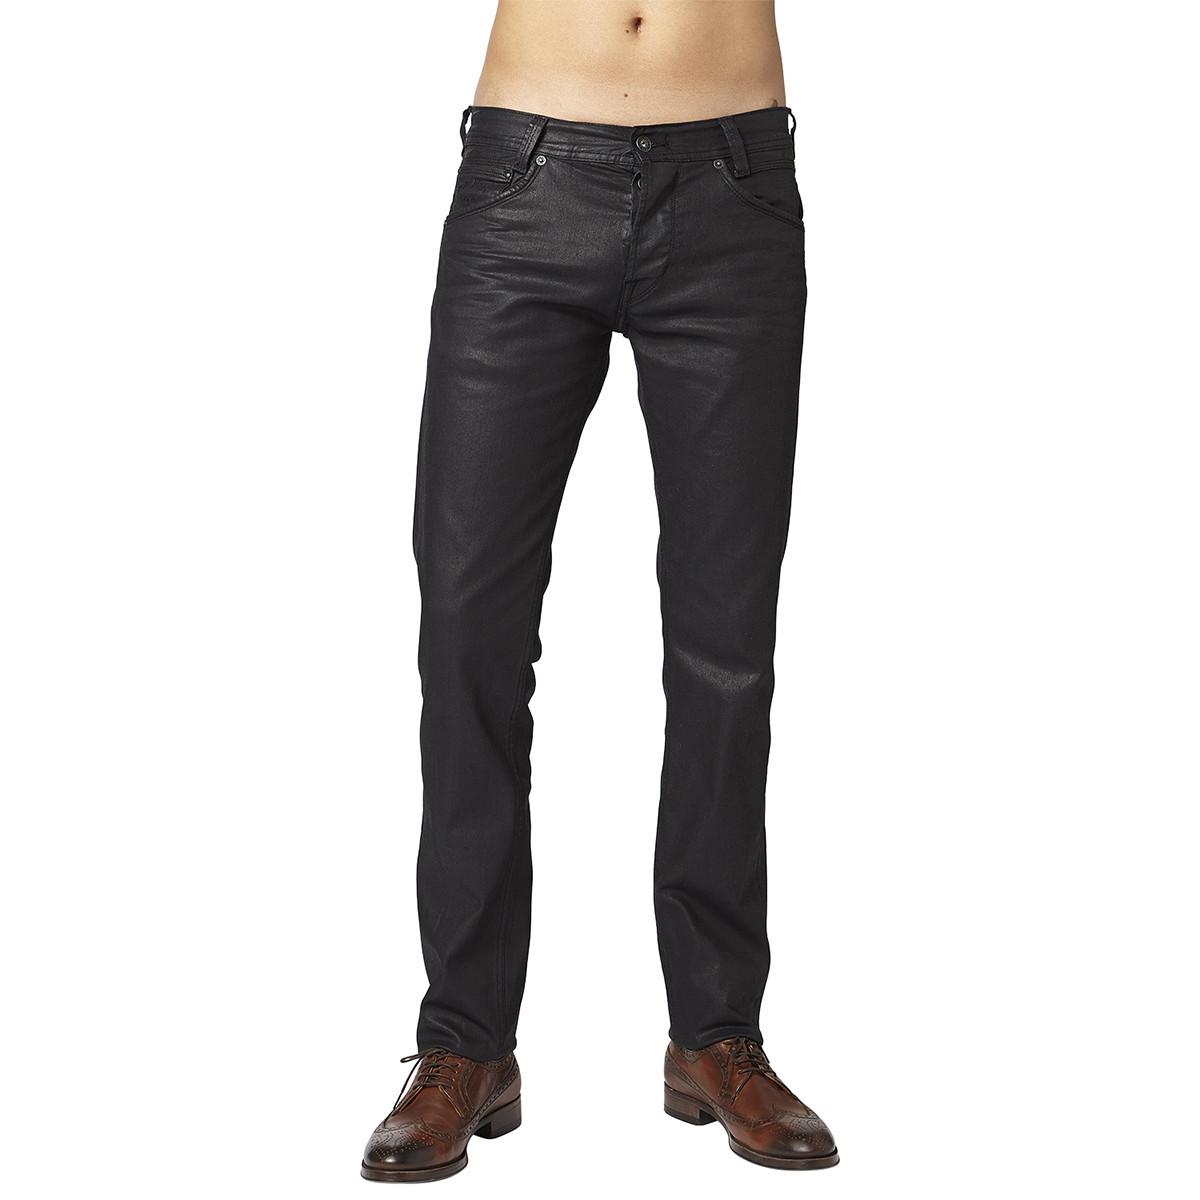 Spike Longueur 34 Jeans Homme